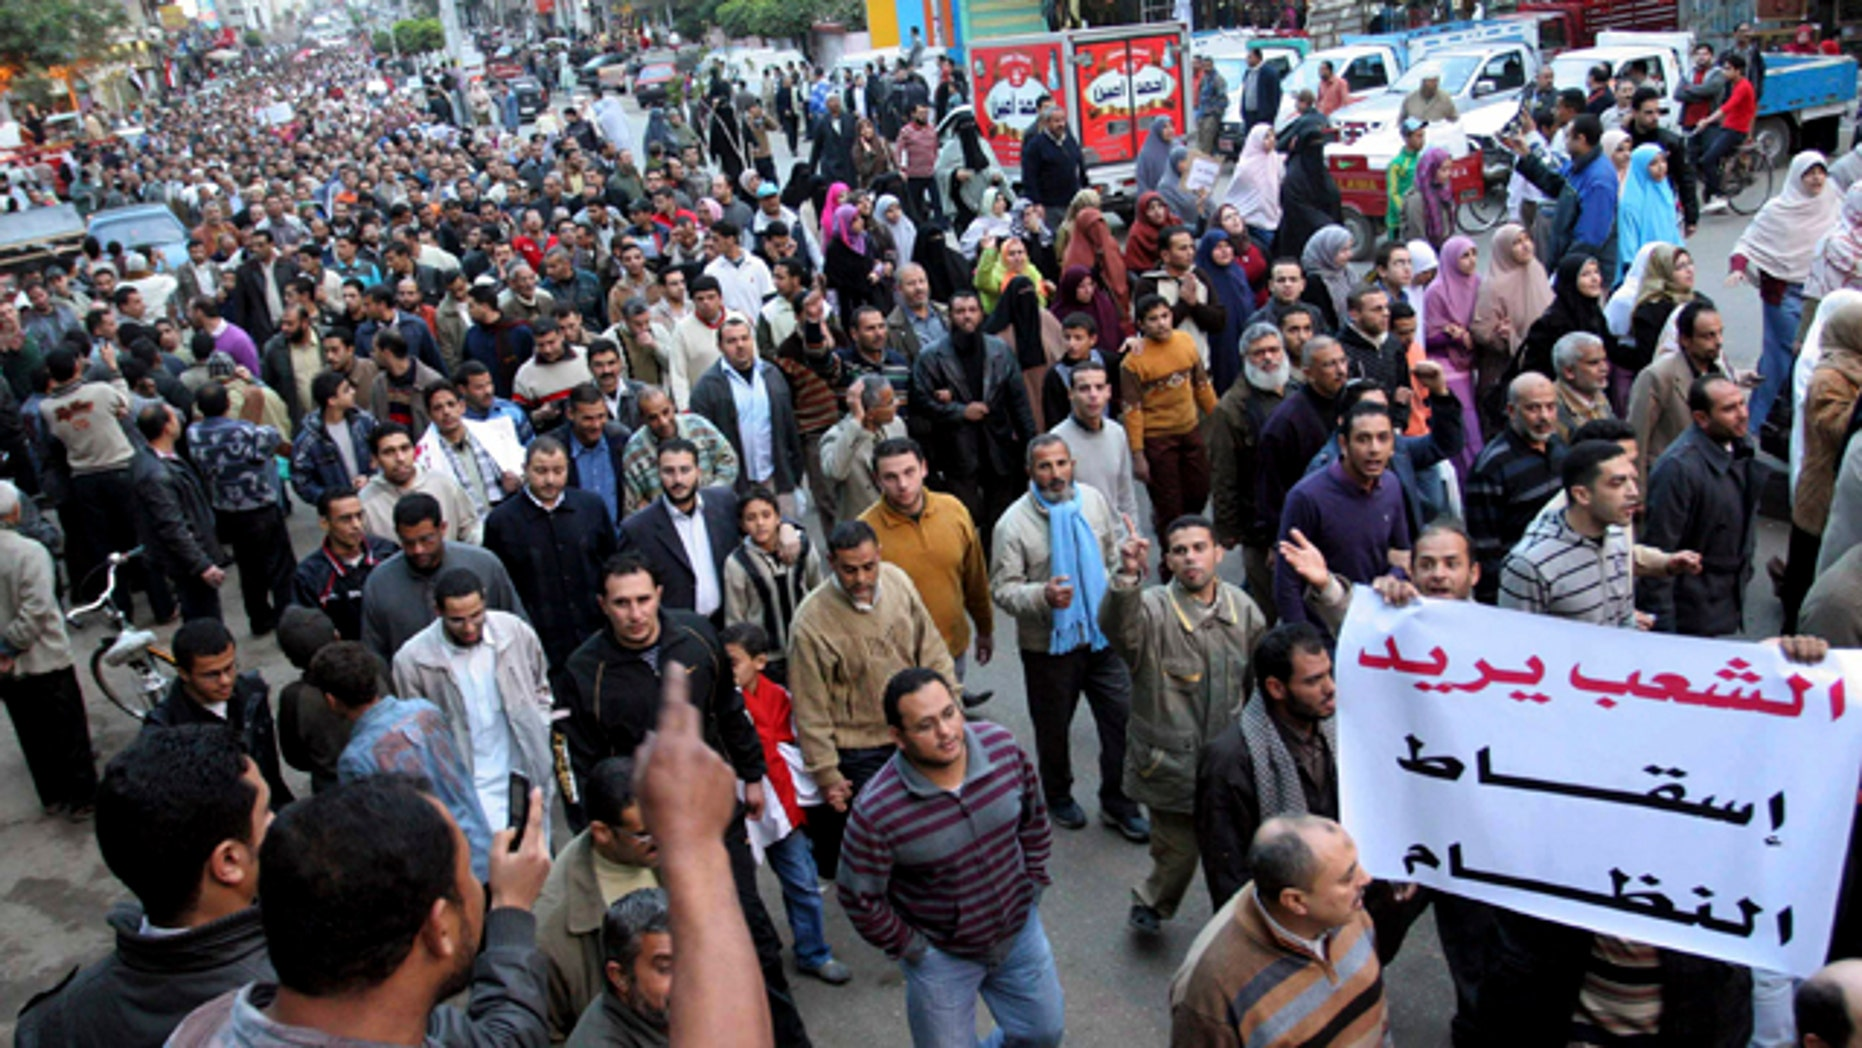 Feb. 6, 2011: Egyptian anti-Mubarak protesters march in al Mansoura city, Egypt.